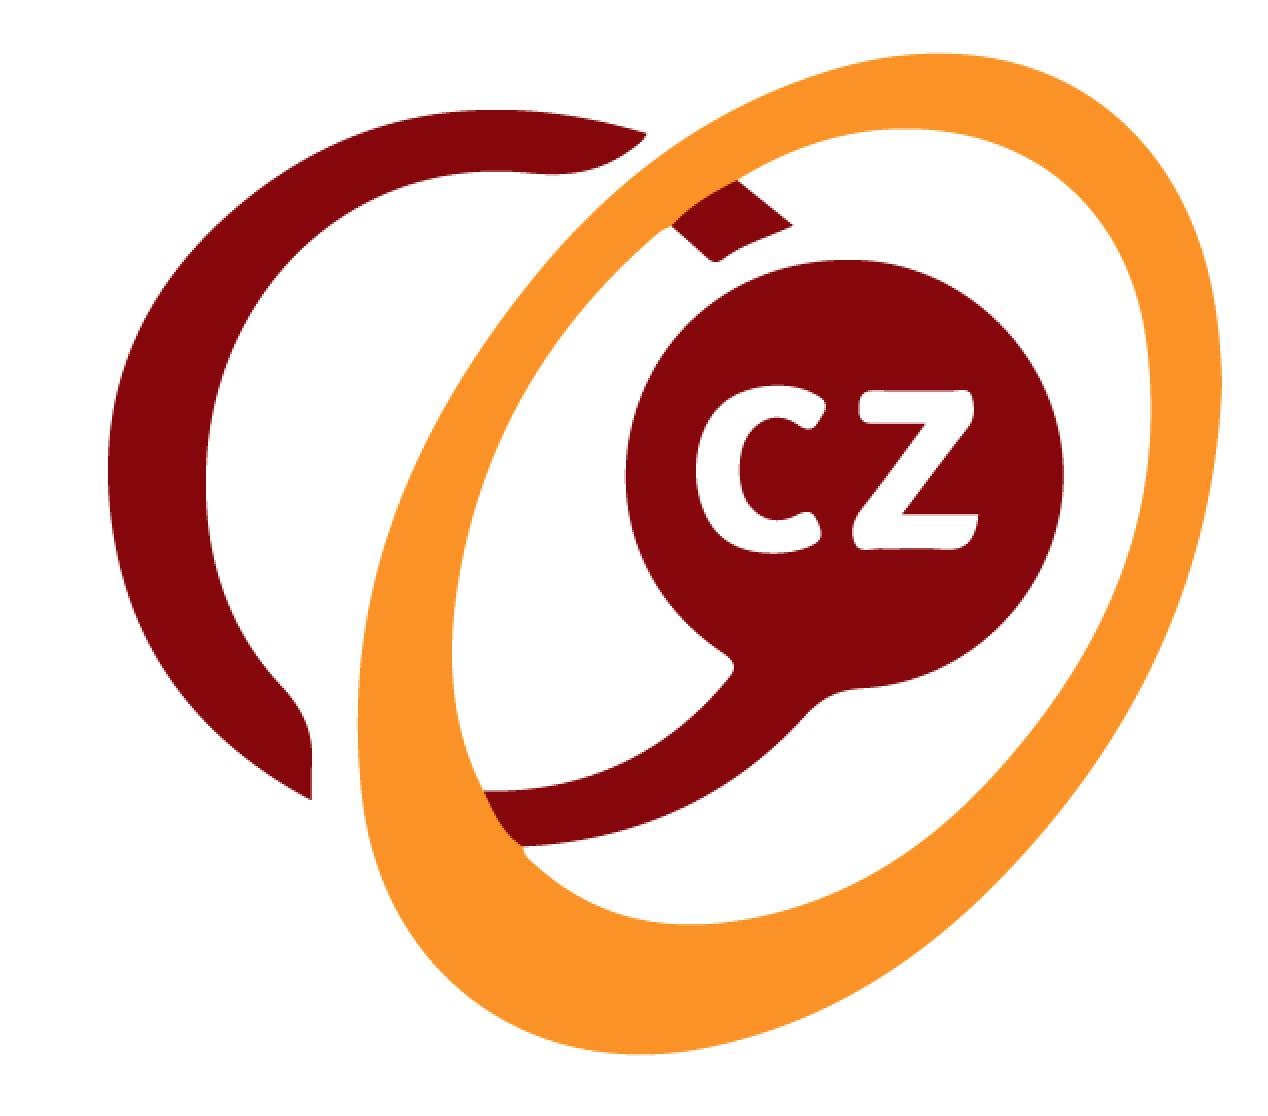 CZ (Netherlands)